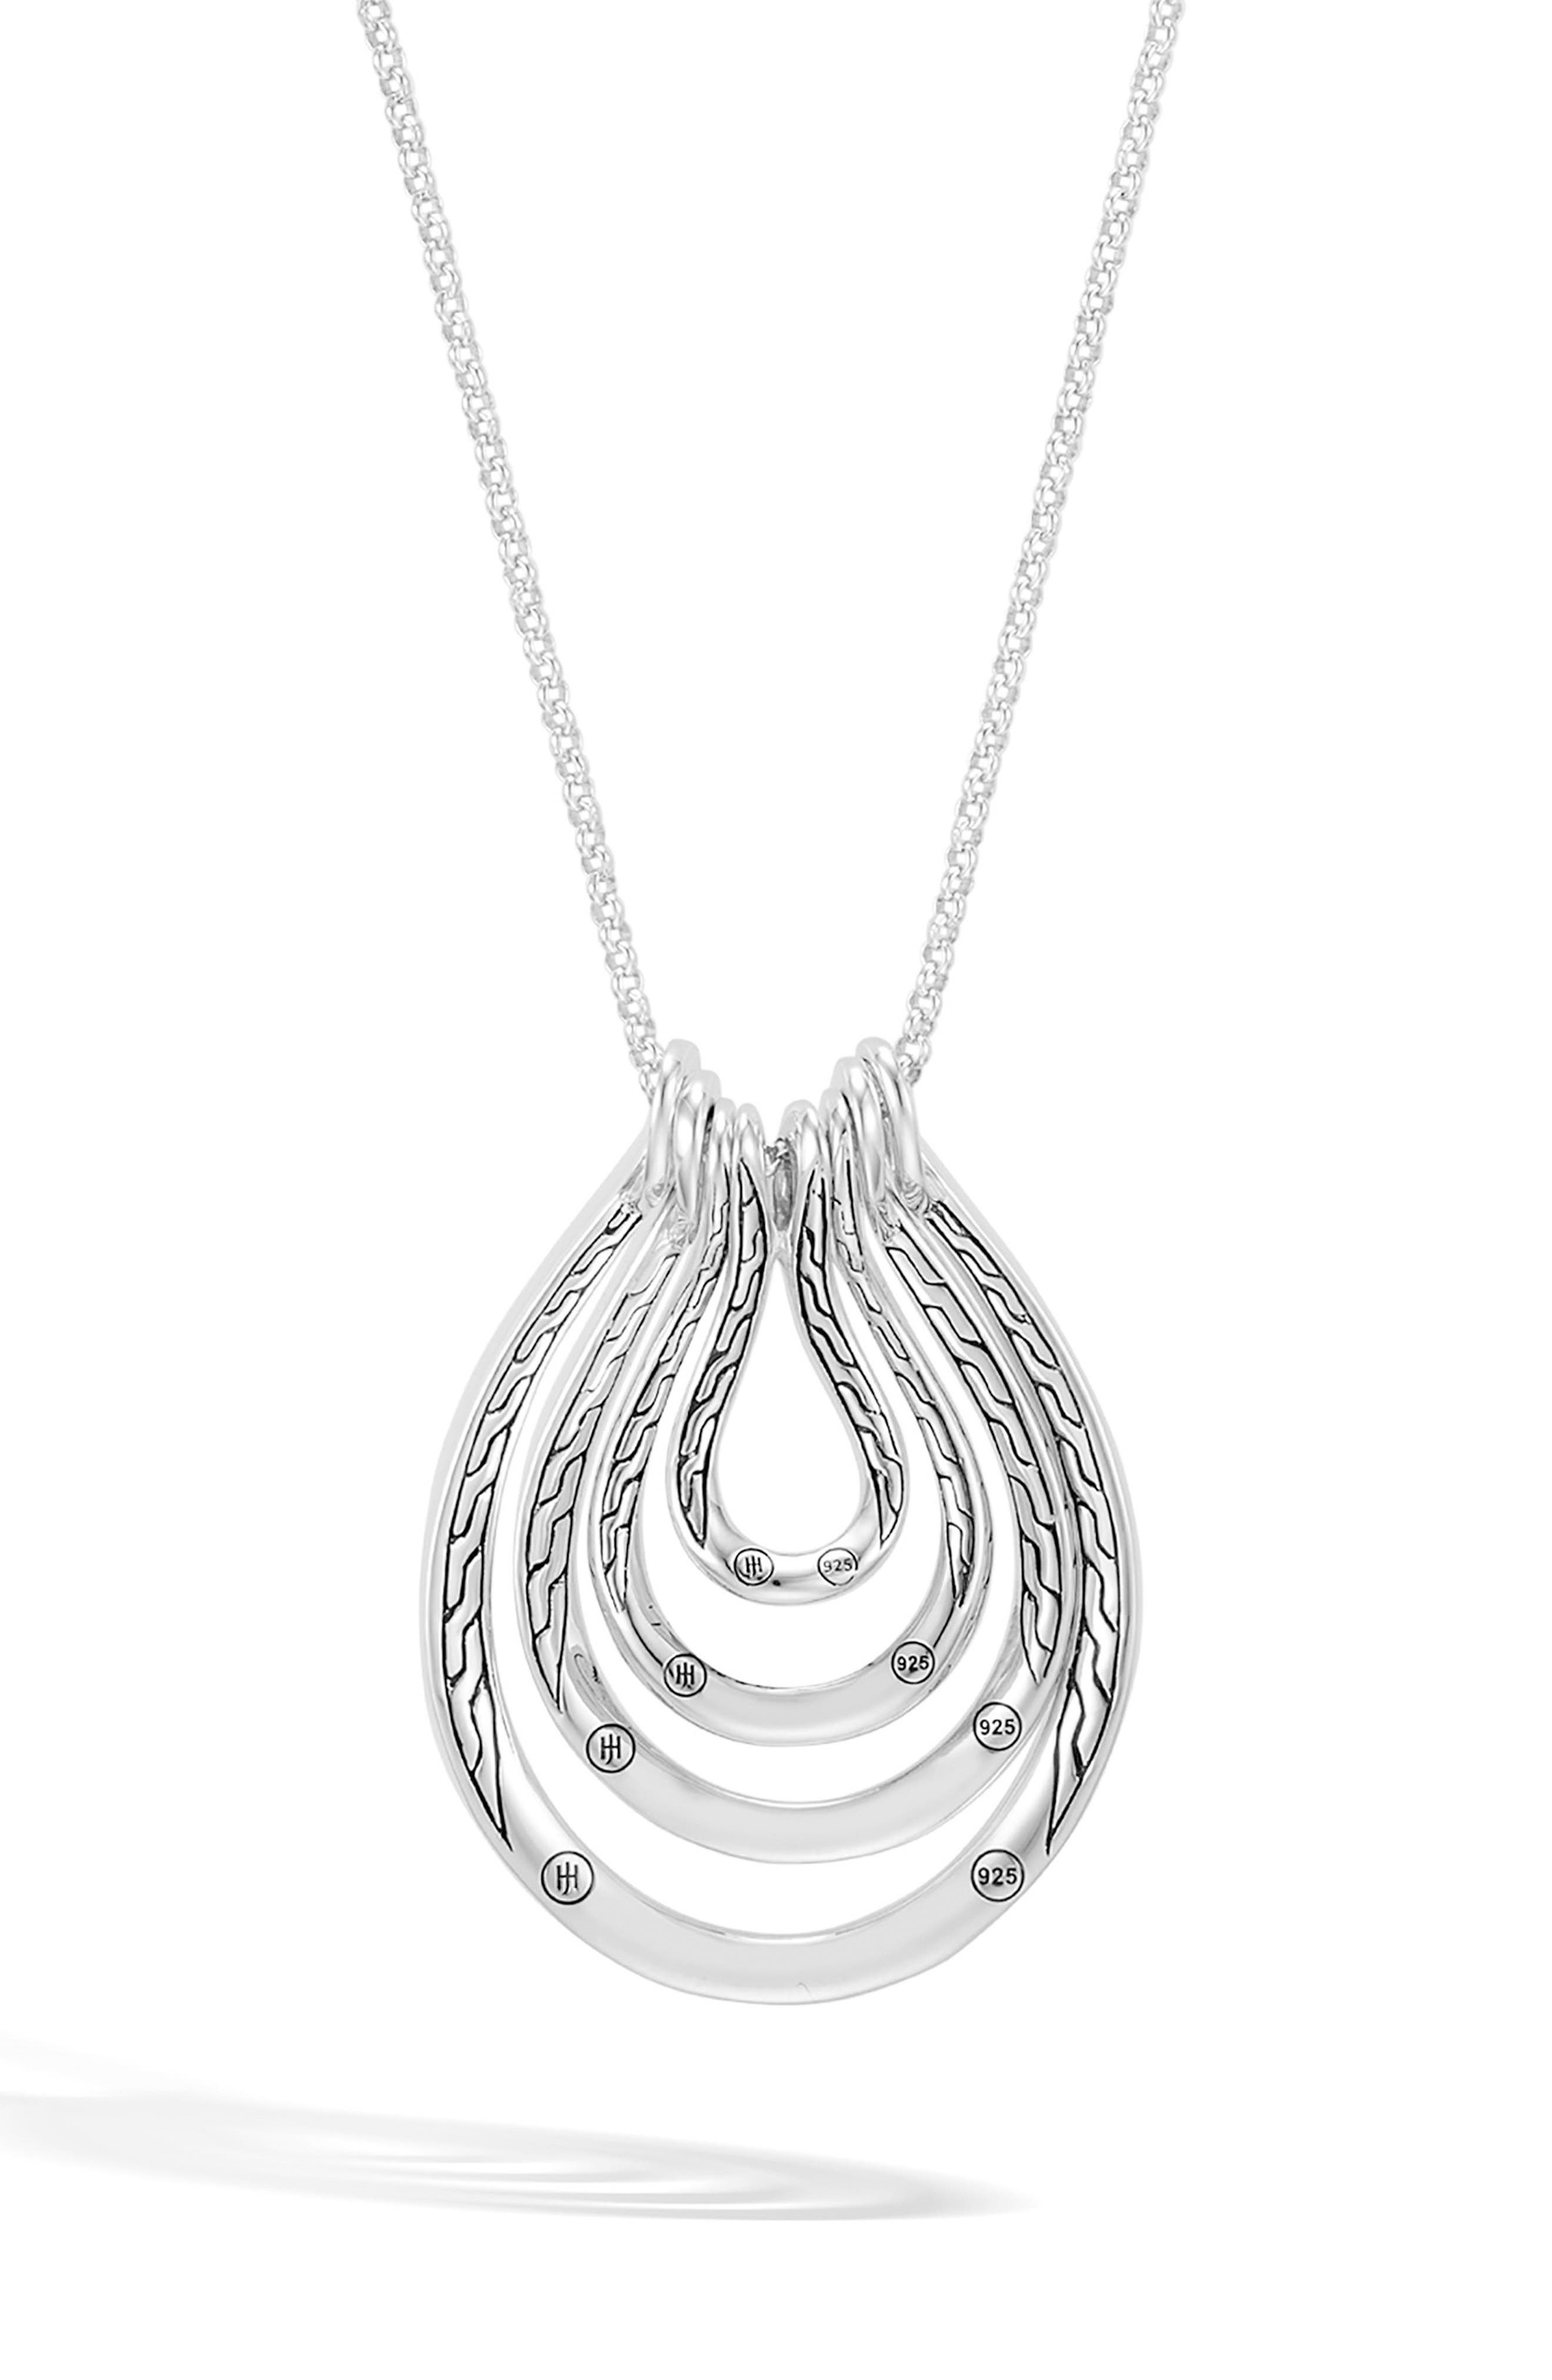 Asli Classic Chain Long Pendant Necklace,                             Alternate thumbnail 2, color,                             SILVER